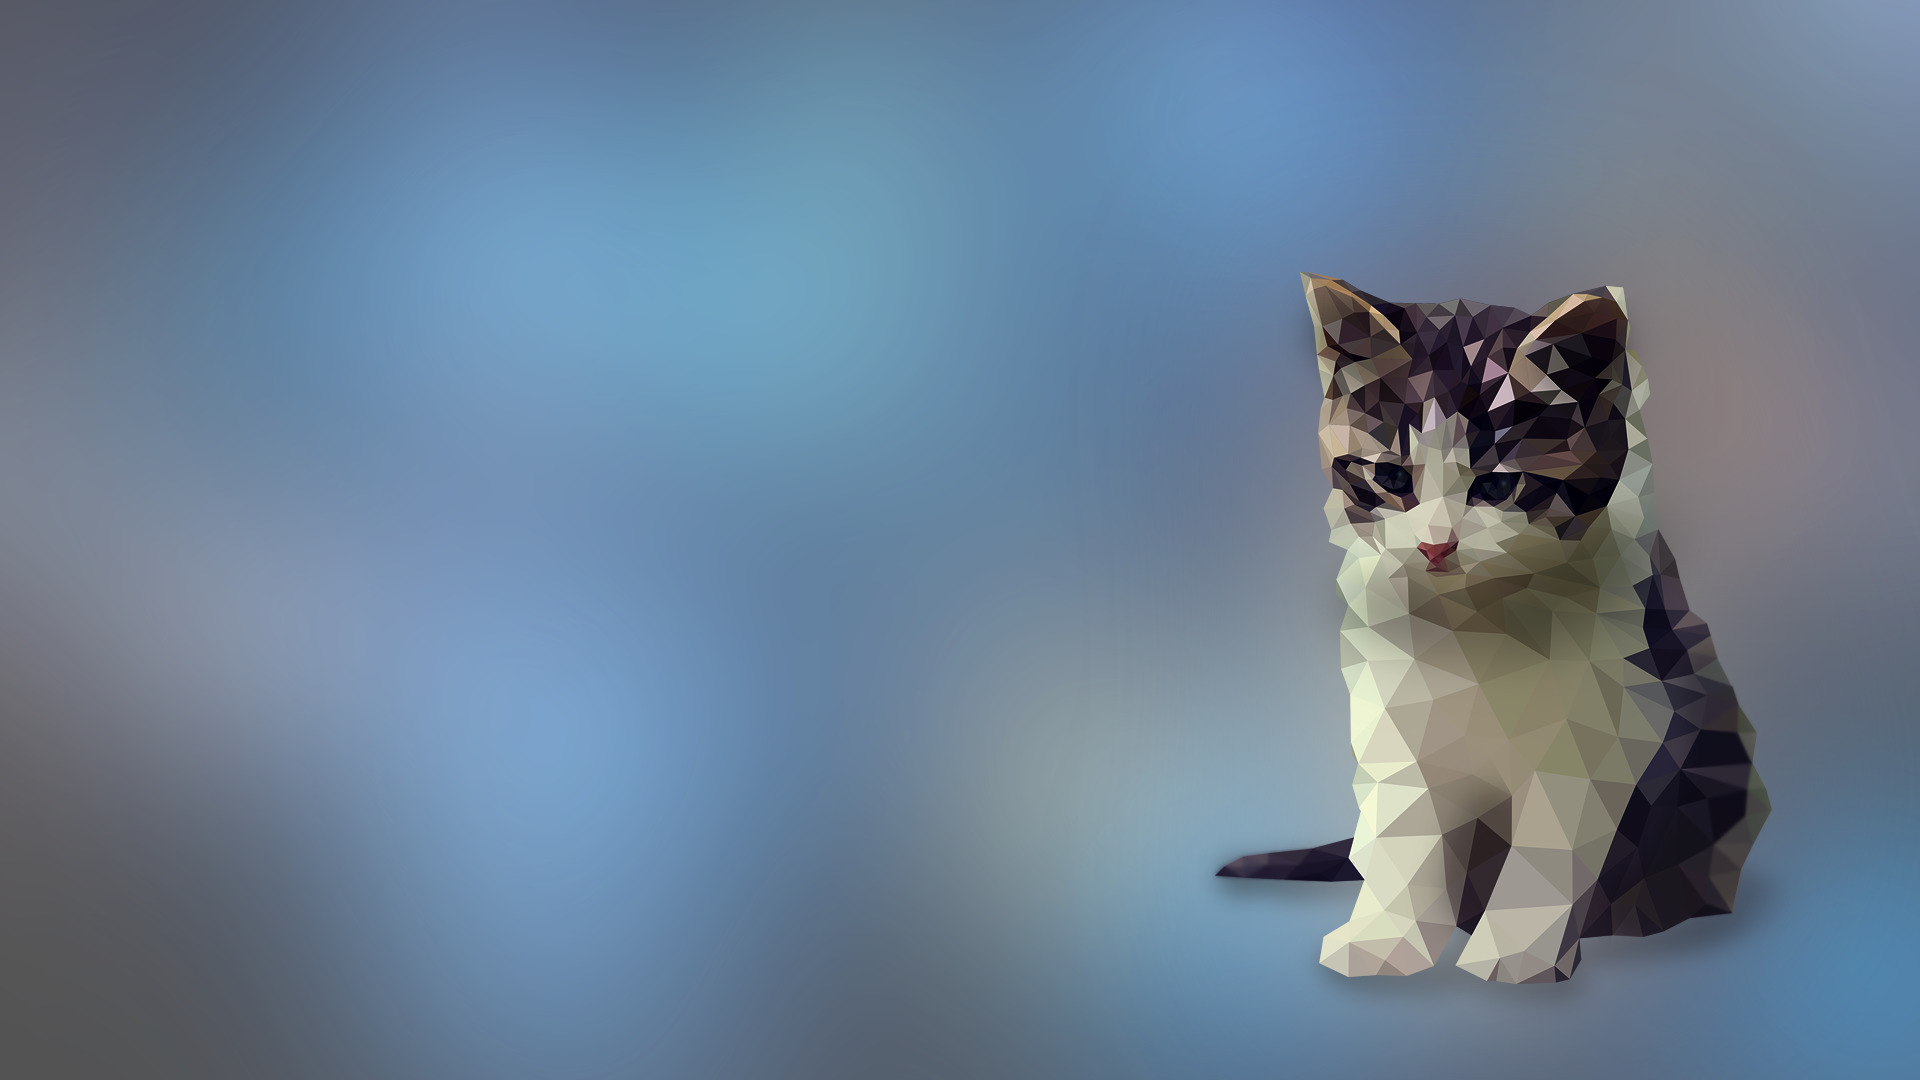 Cat Cute Wallpaper Download Digital Art Kittens Low Poly Cat Animals Wallpapers Hd